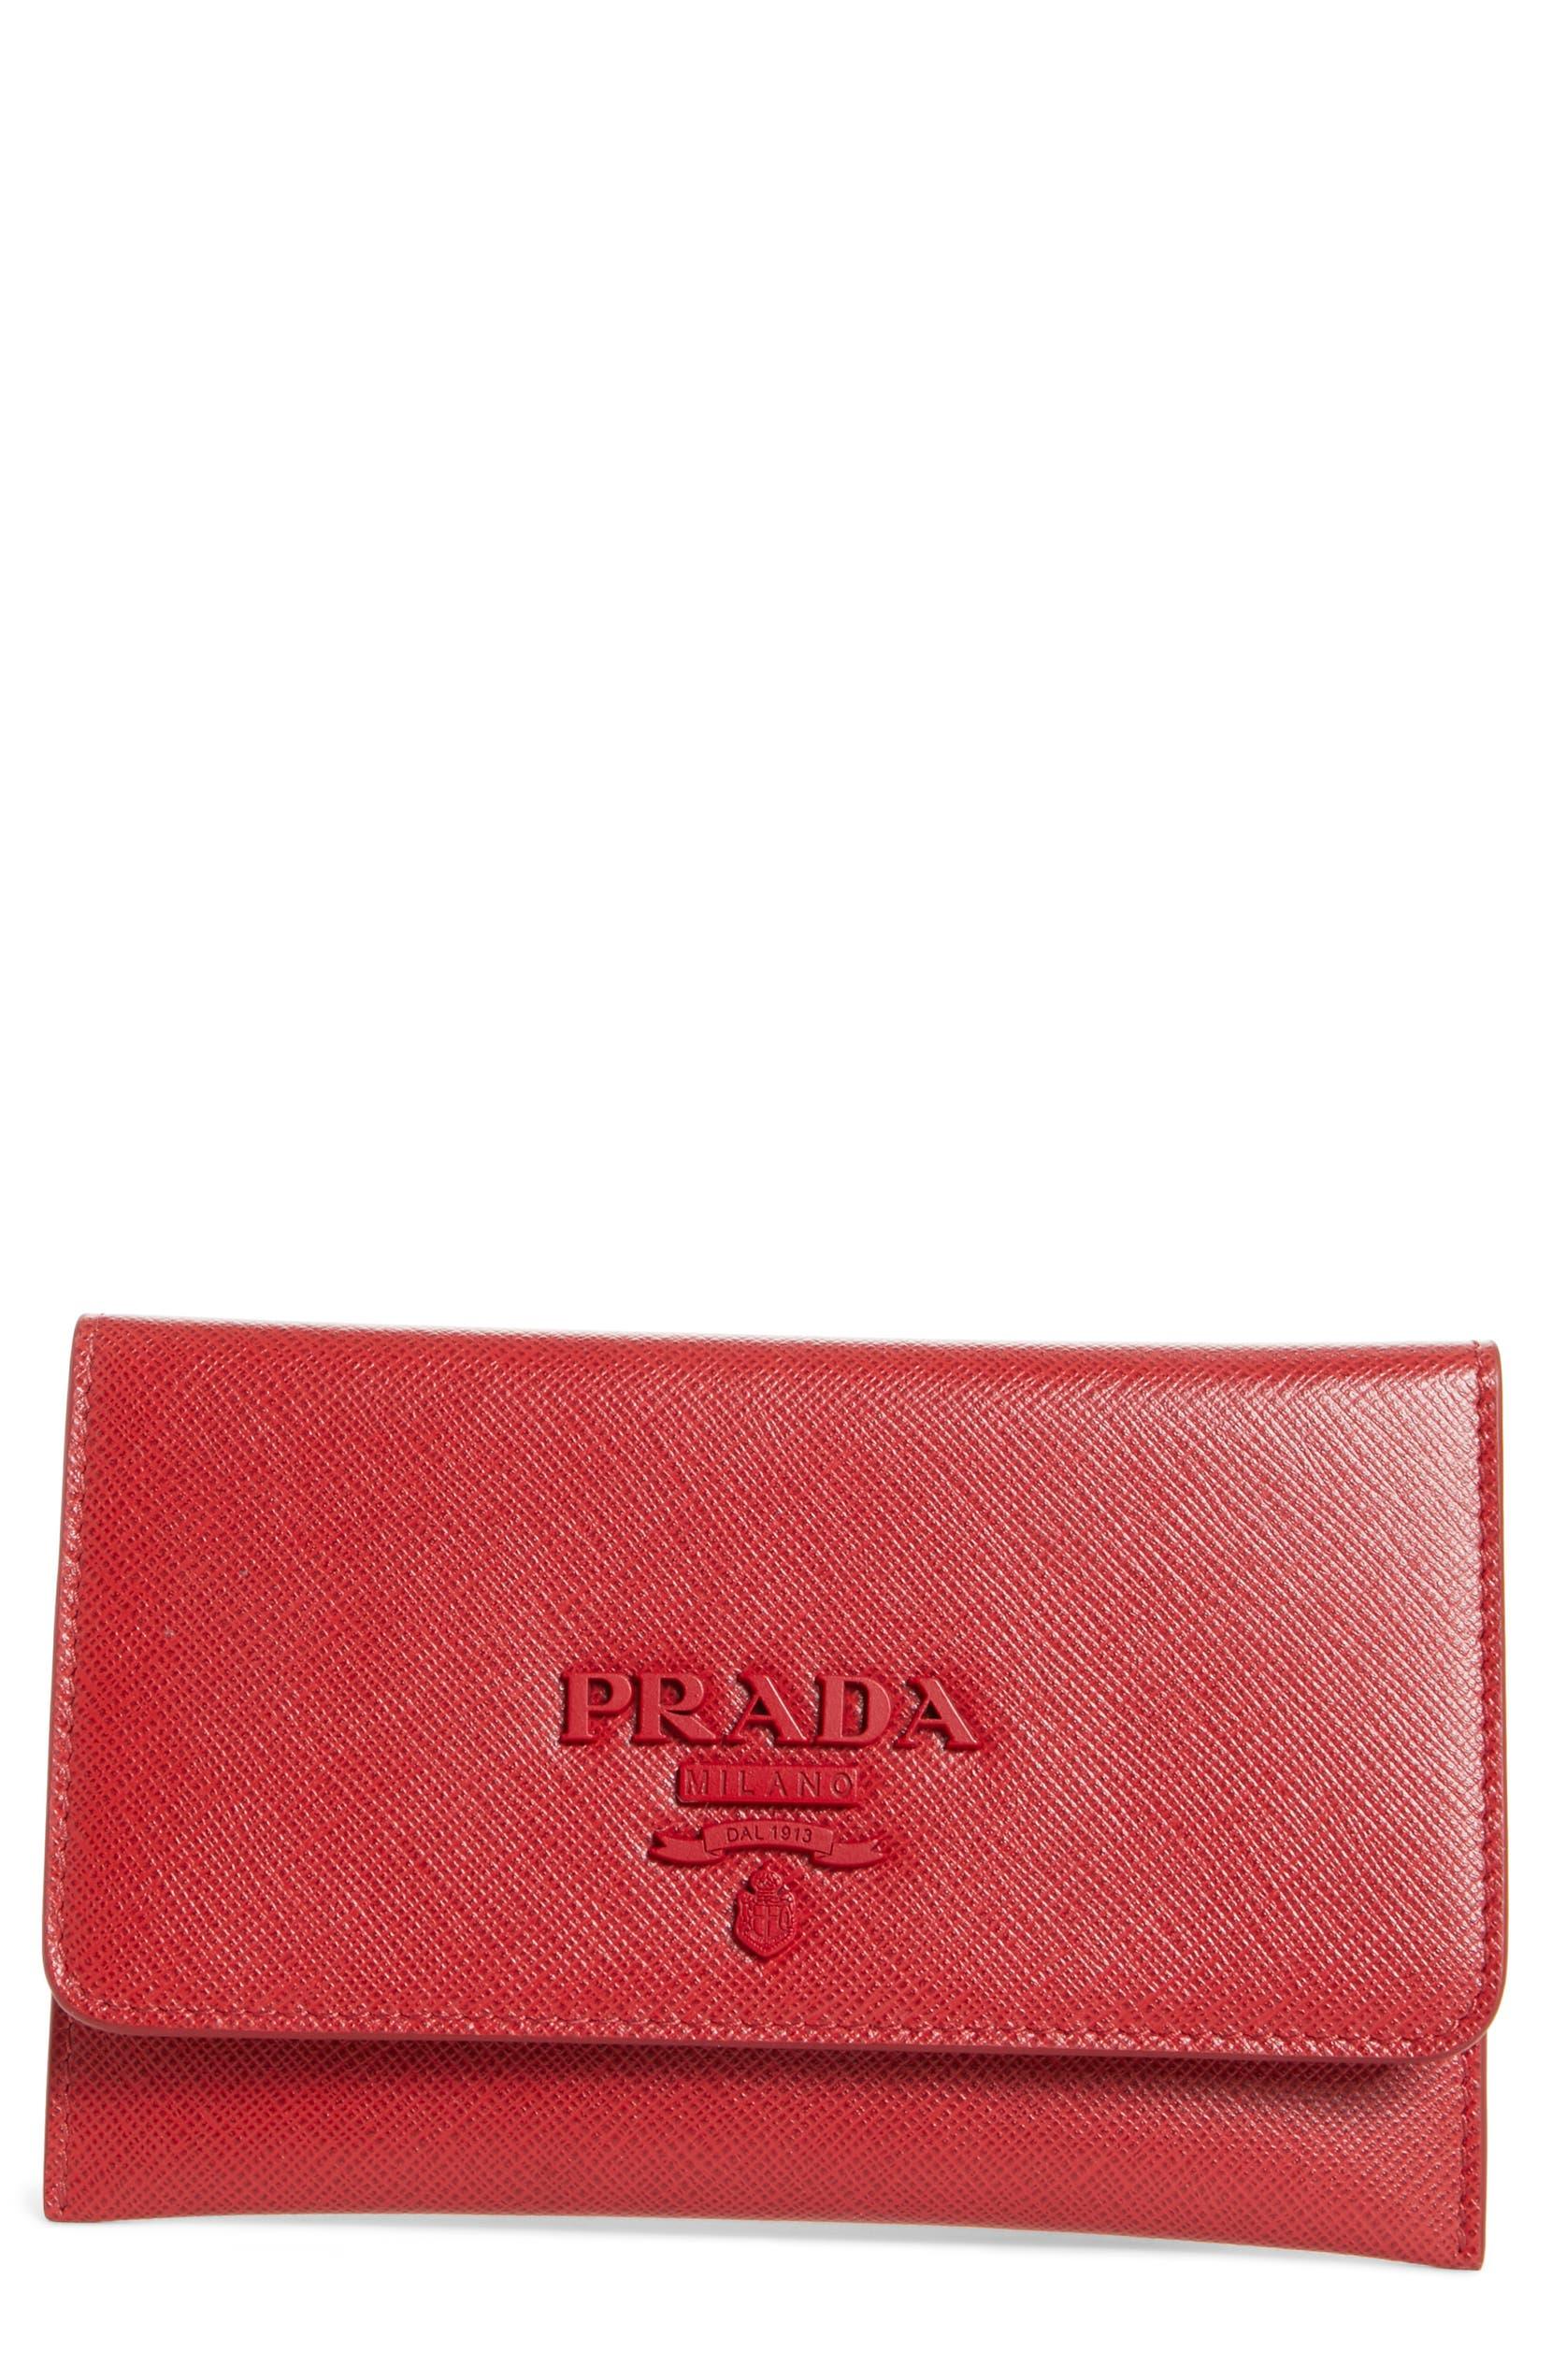 92a02b8f62212e Prada Saffiano Leather Wallet | Nordstrom